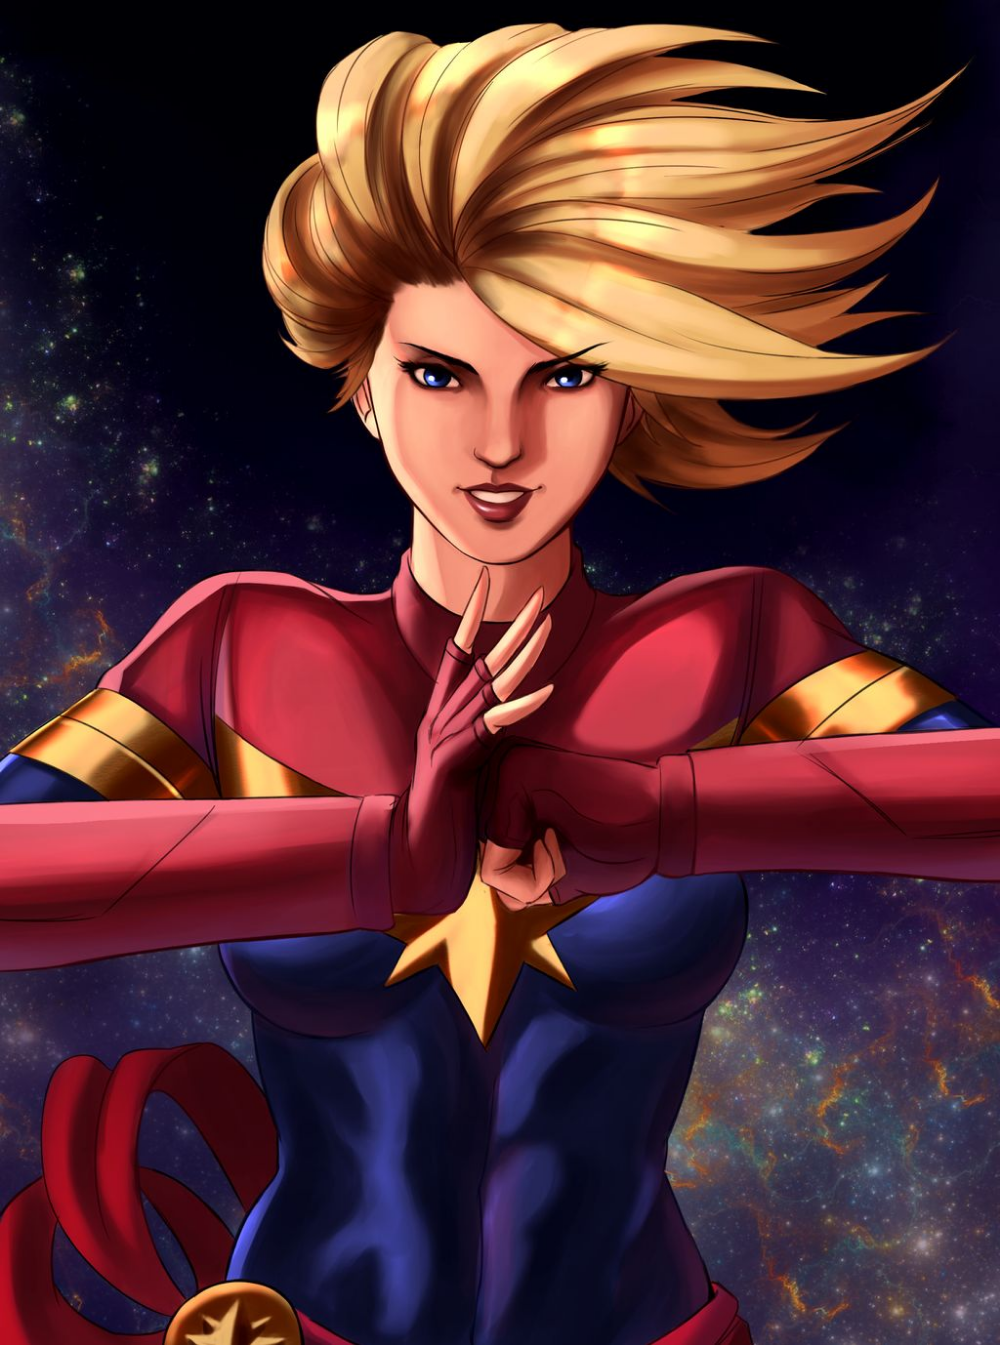 Carol Danvers A K A Captain Marvel By Mistery12 On Deviantart Captain Marvel Captain Marvel Carol Danvers Marvel